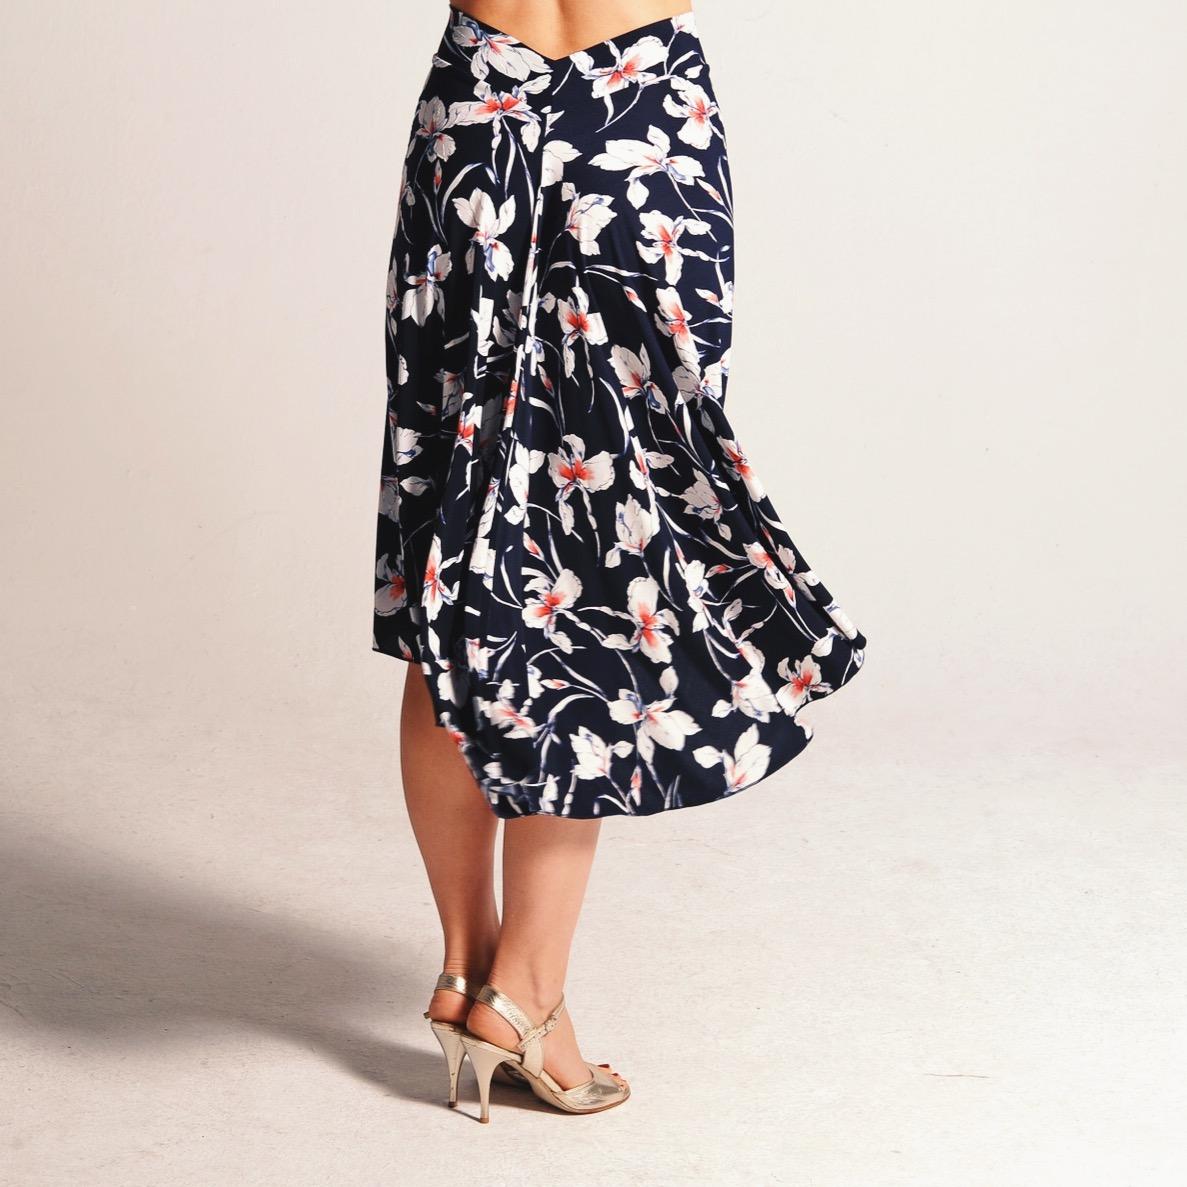 PAOLA_spring_floral_tango_skirt.JPG